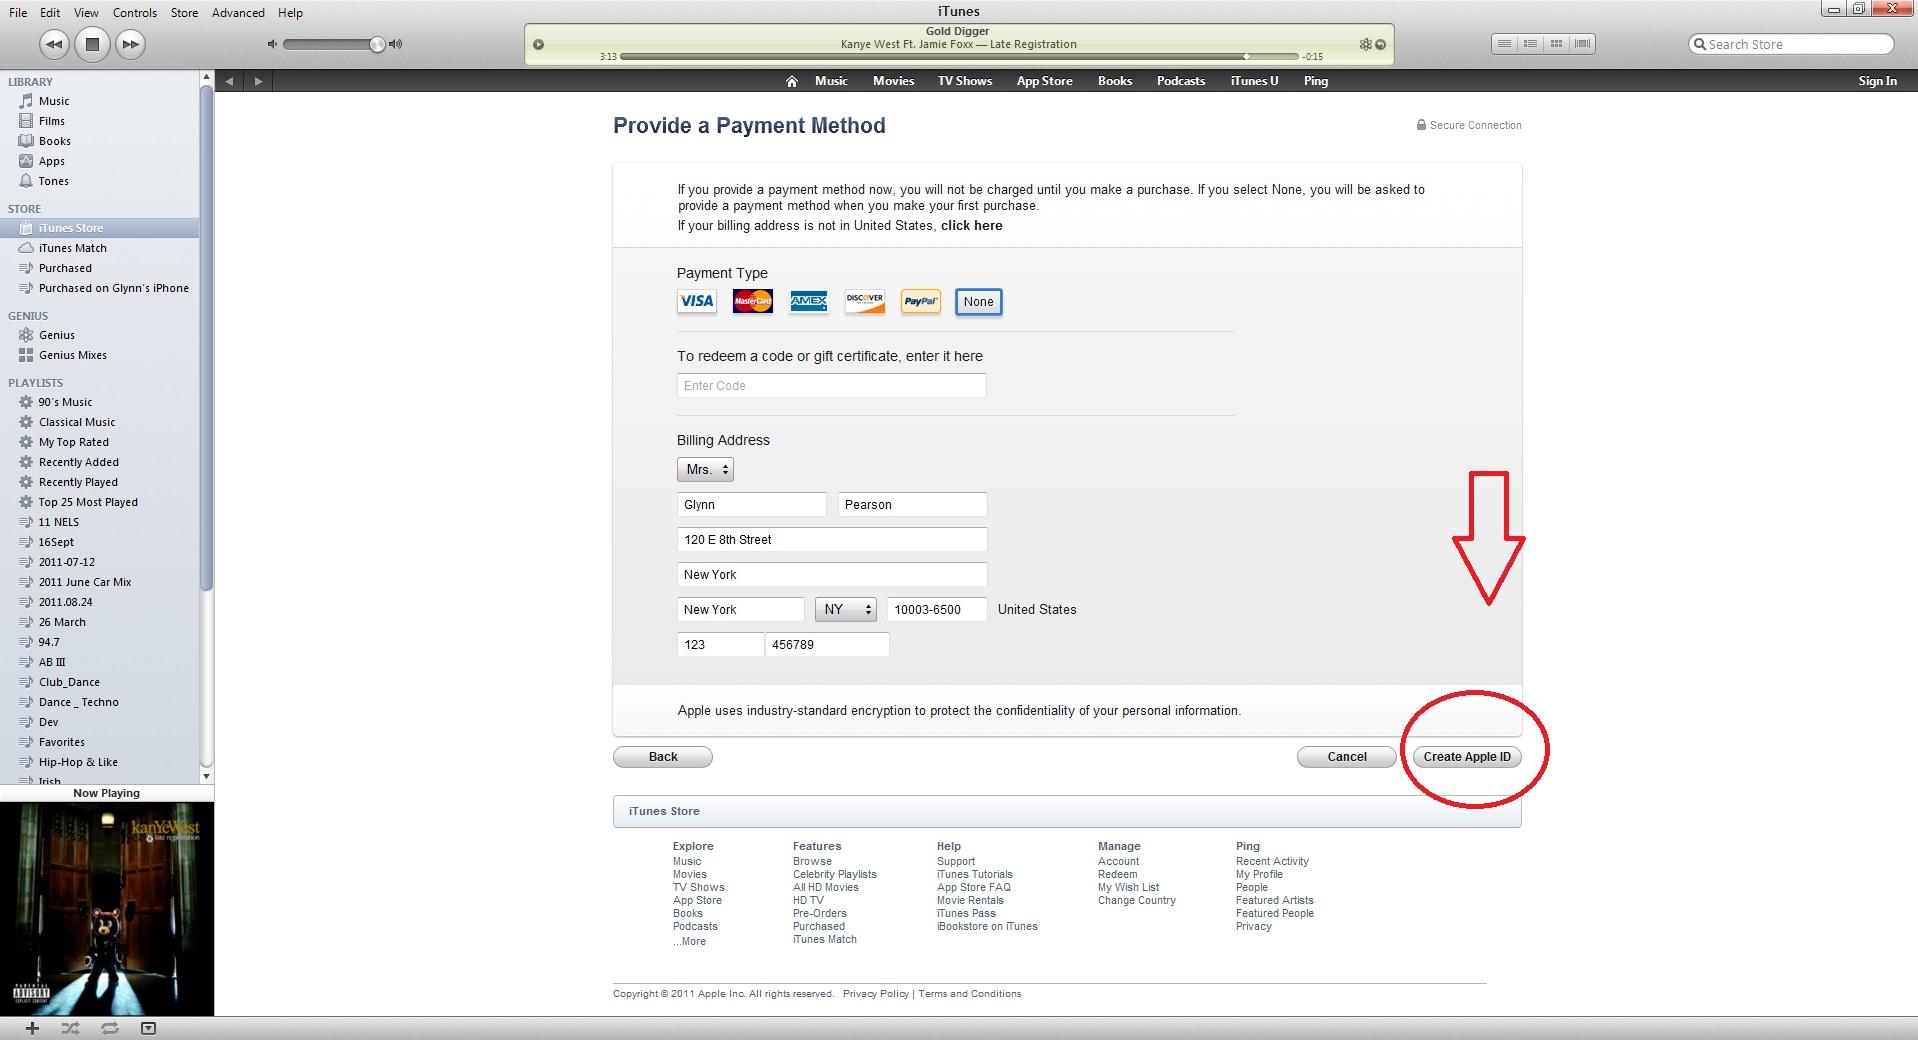 how to create my apple id